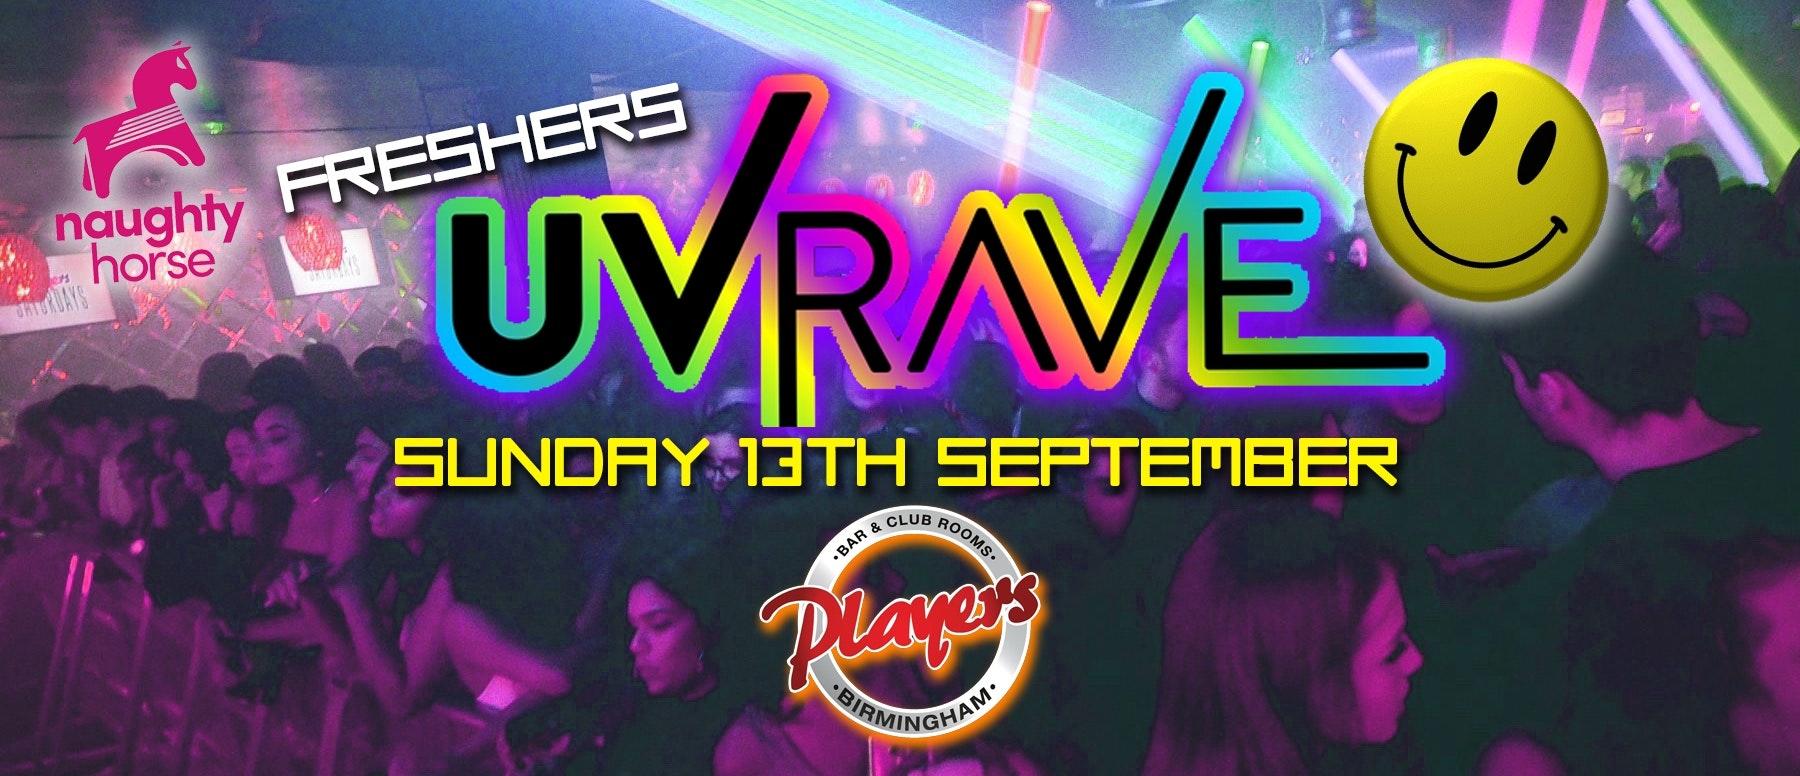 Birmingham Freshers Move in Sunday (BCU/UCB) – UV NEON RAVE at Players!